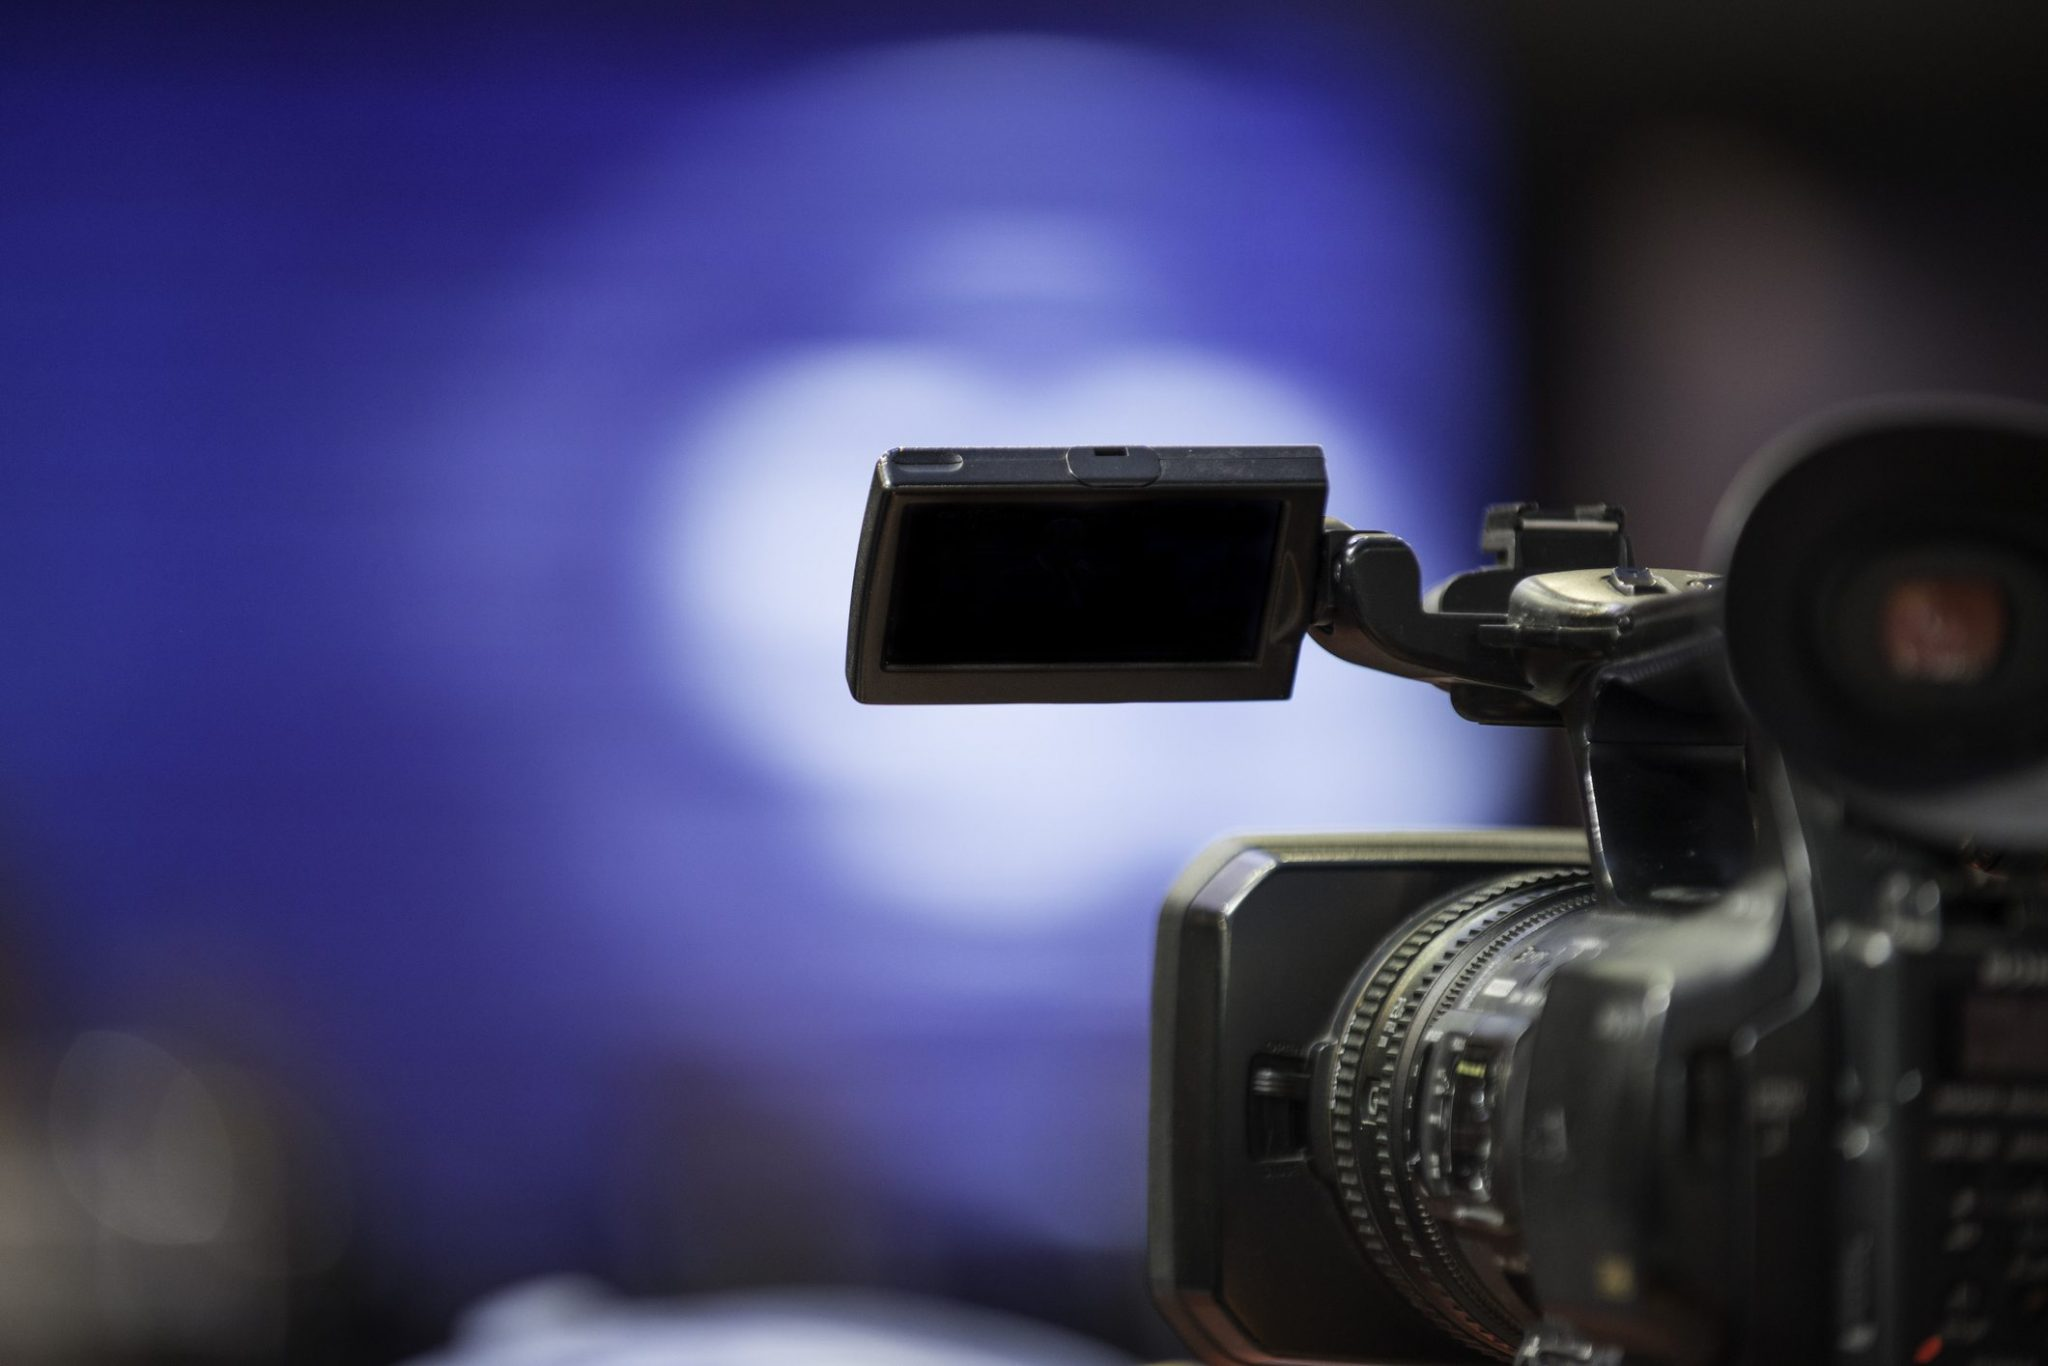 Developing Your Media Marketing Plan